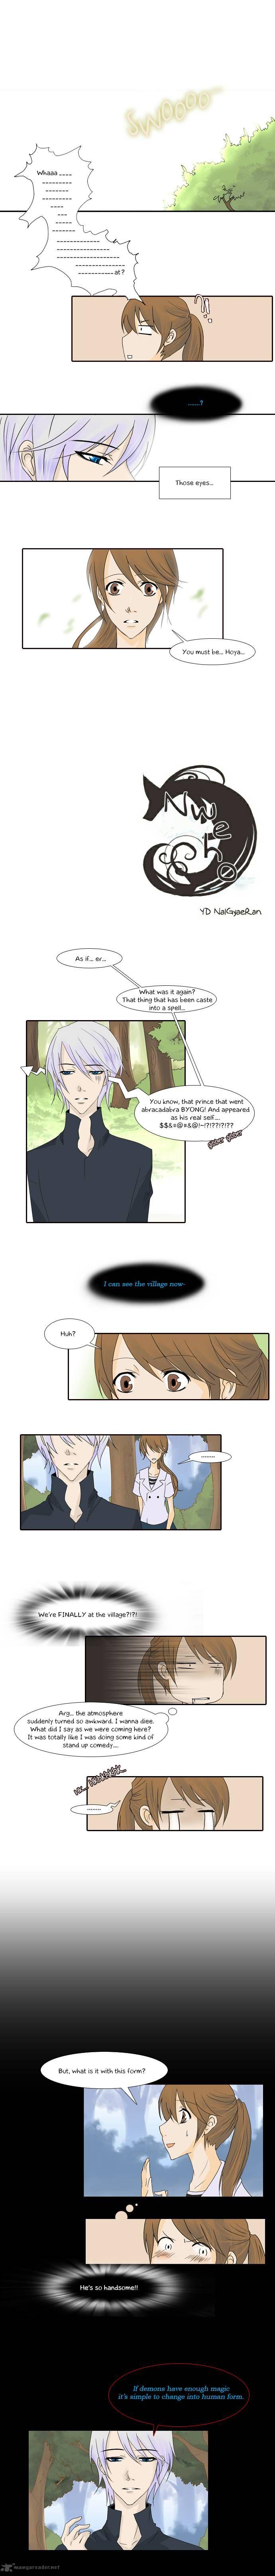 Nweho 6 Page 1